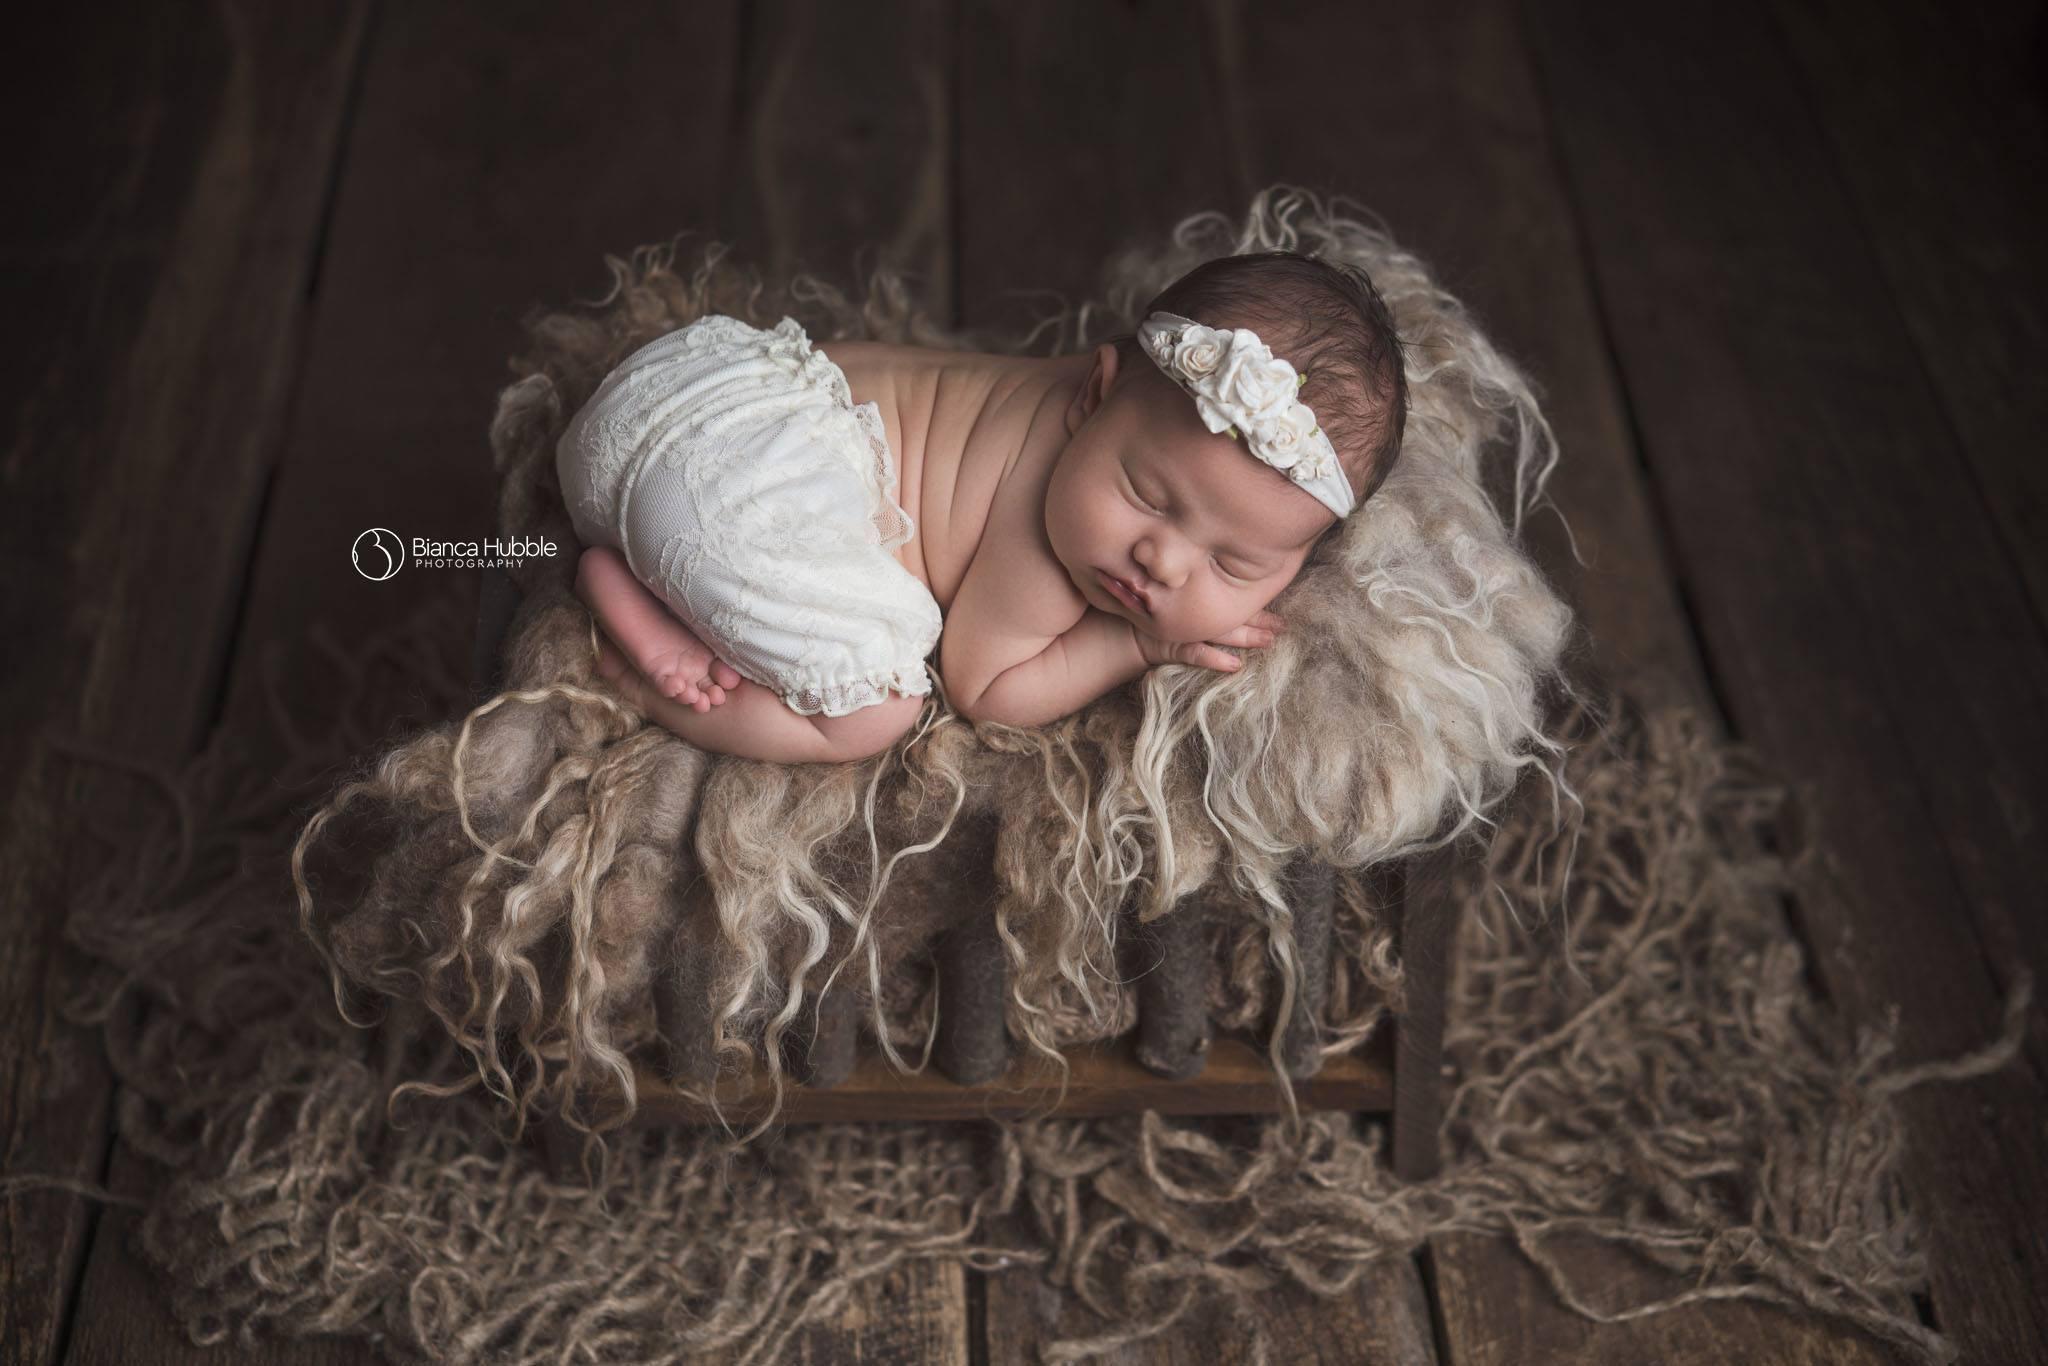 newborn photography business tips image